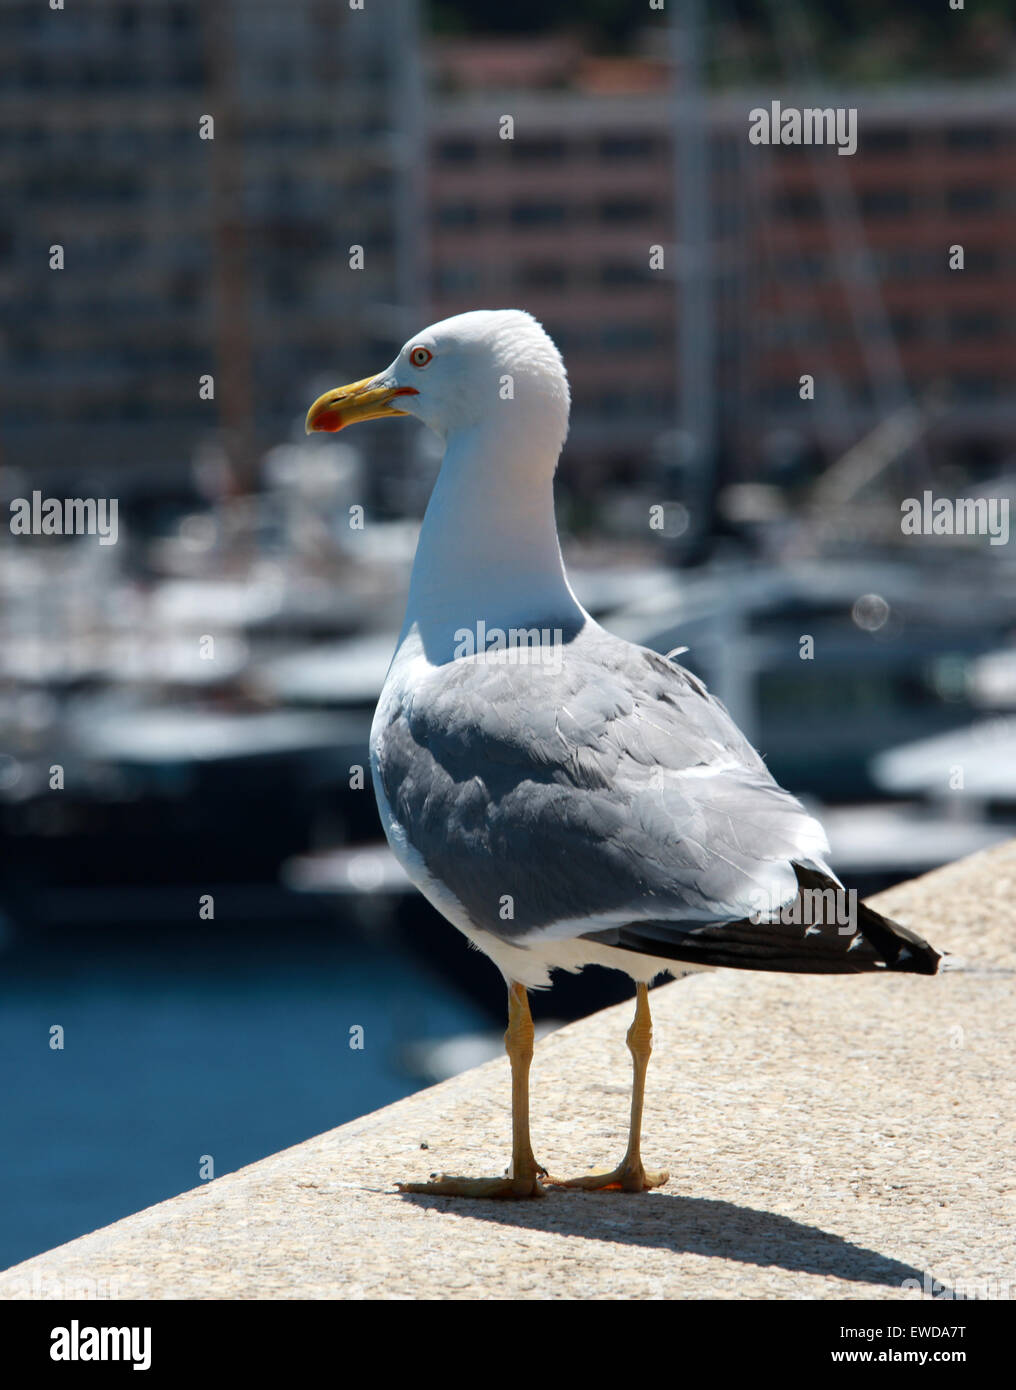 Herring Gull, Larus argentatus, Laridae. - Stock Image